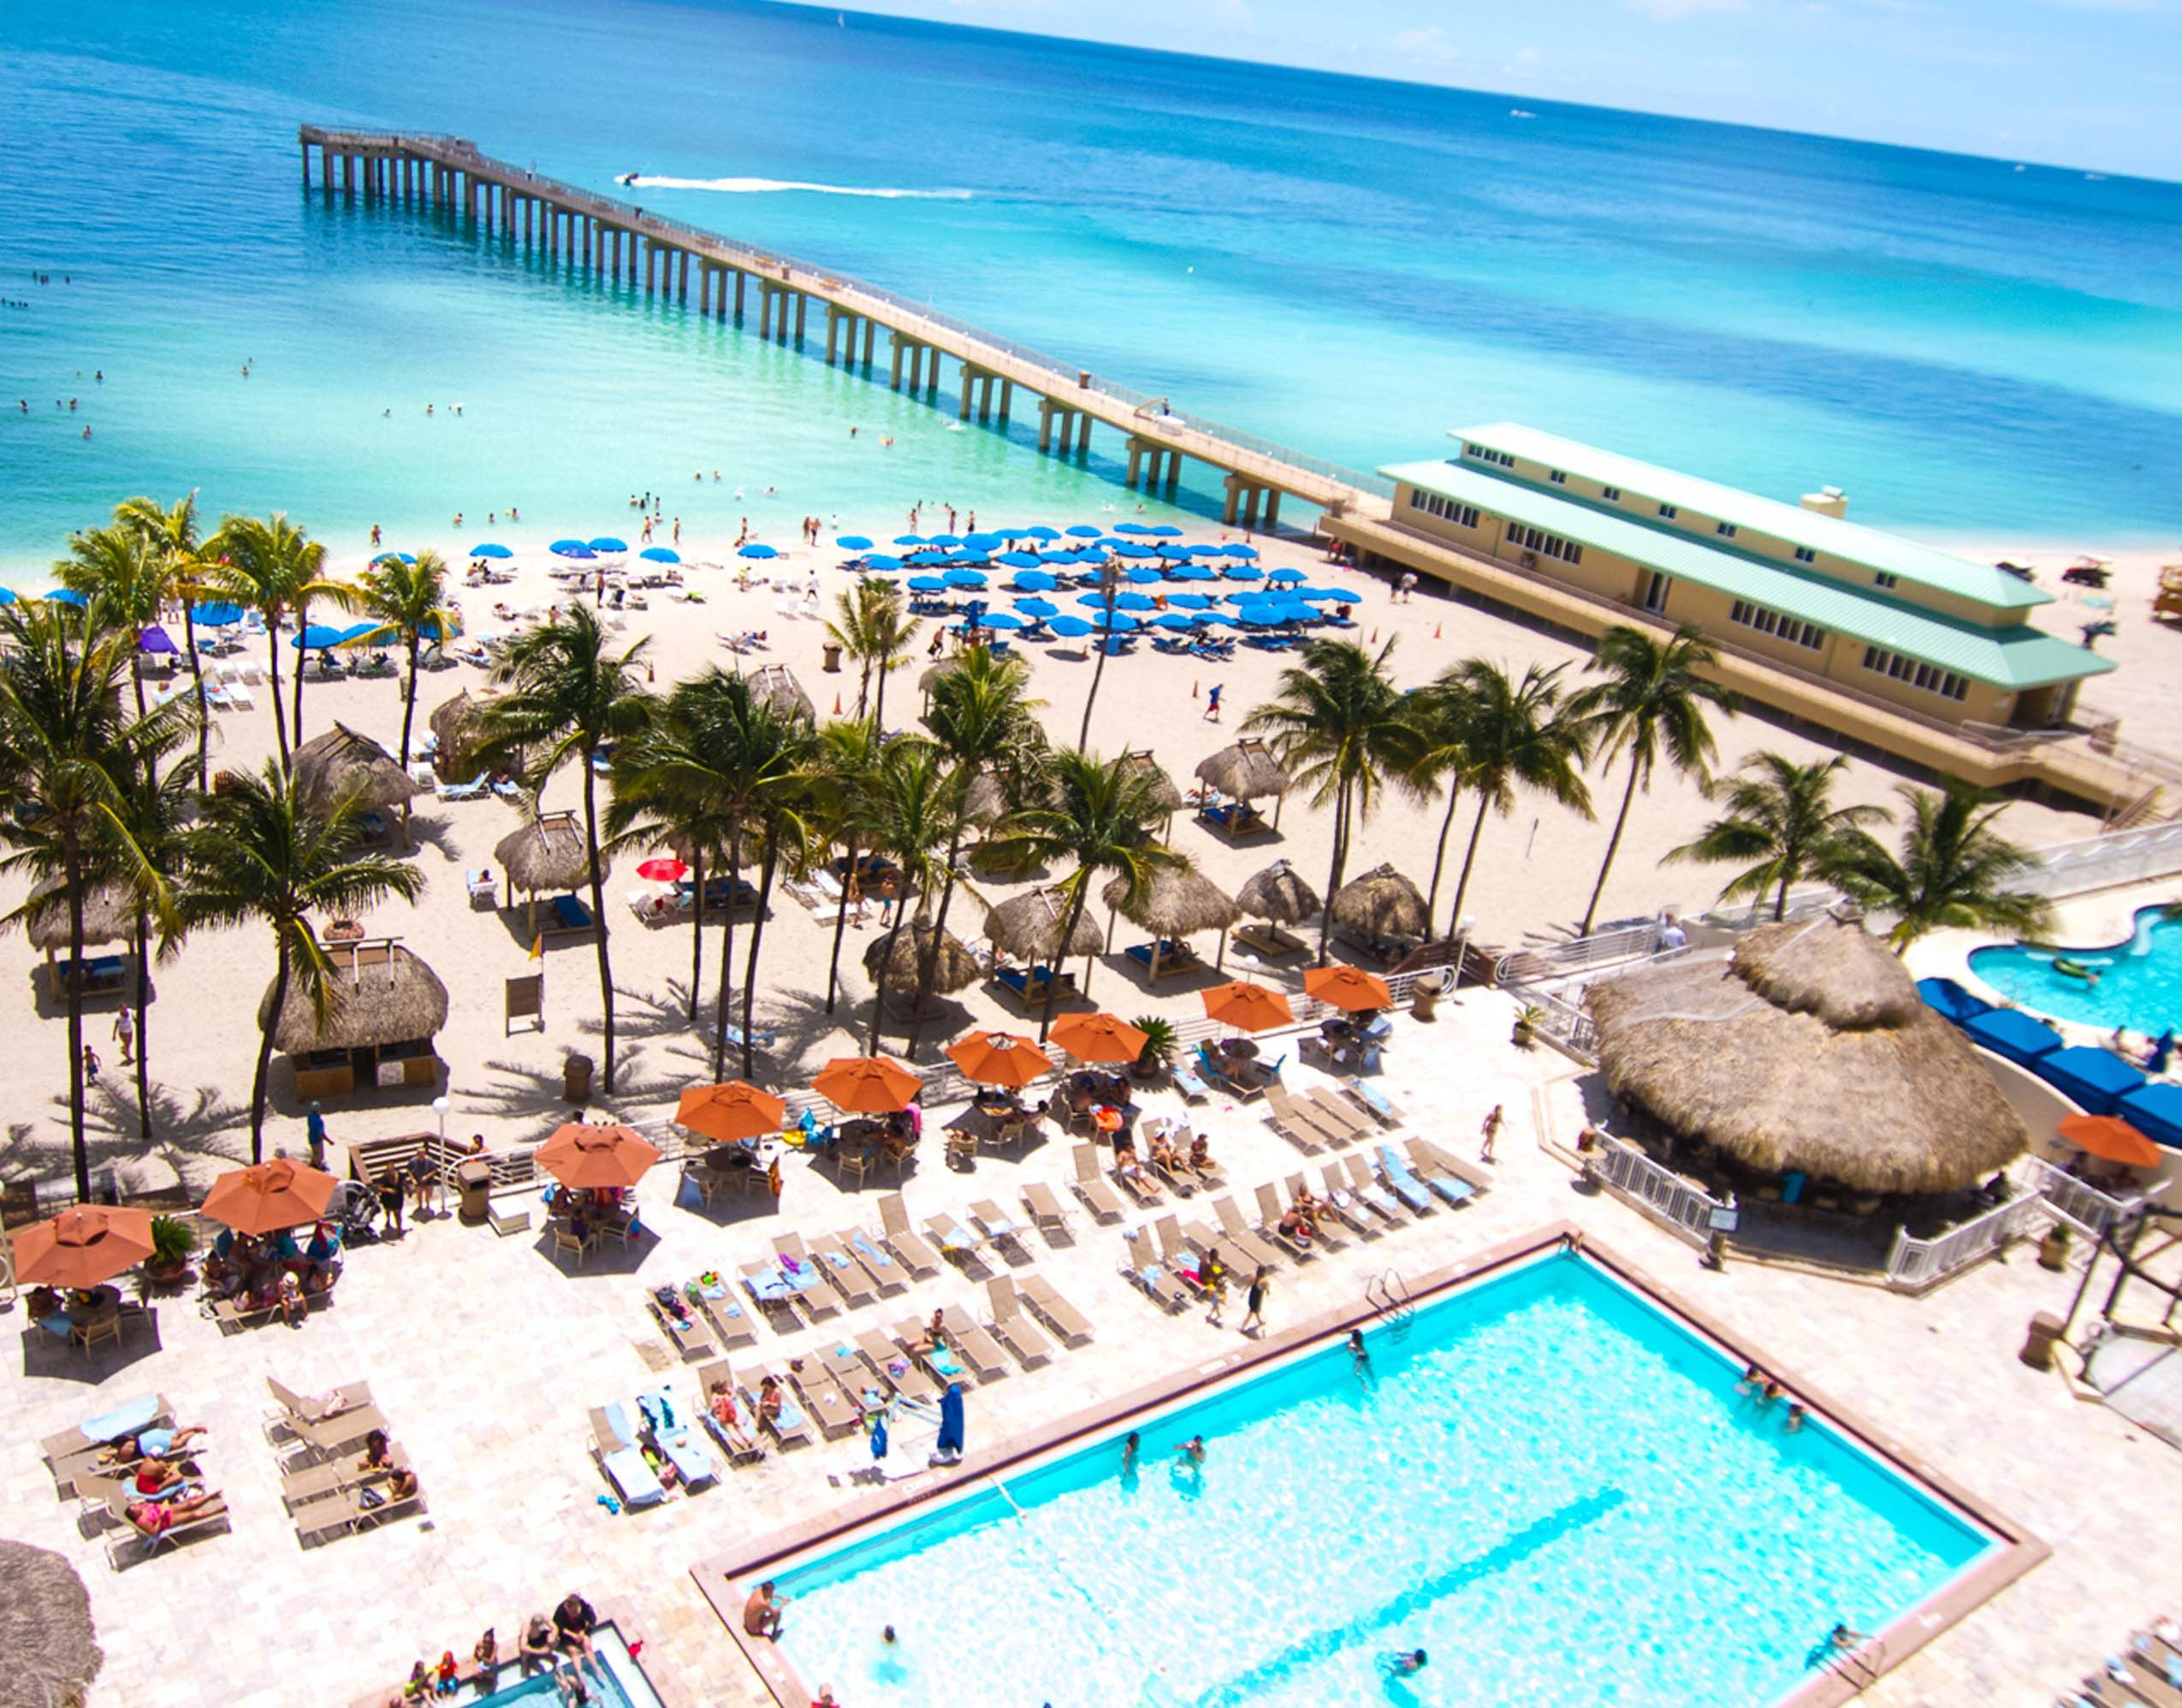 Paradise Hotel Miami Sunnyisles Sunny Beach Isles Vacation Travel Resort Florida Beaches Sun Fun